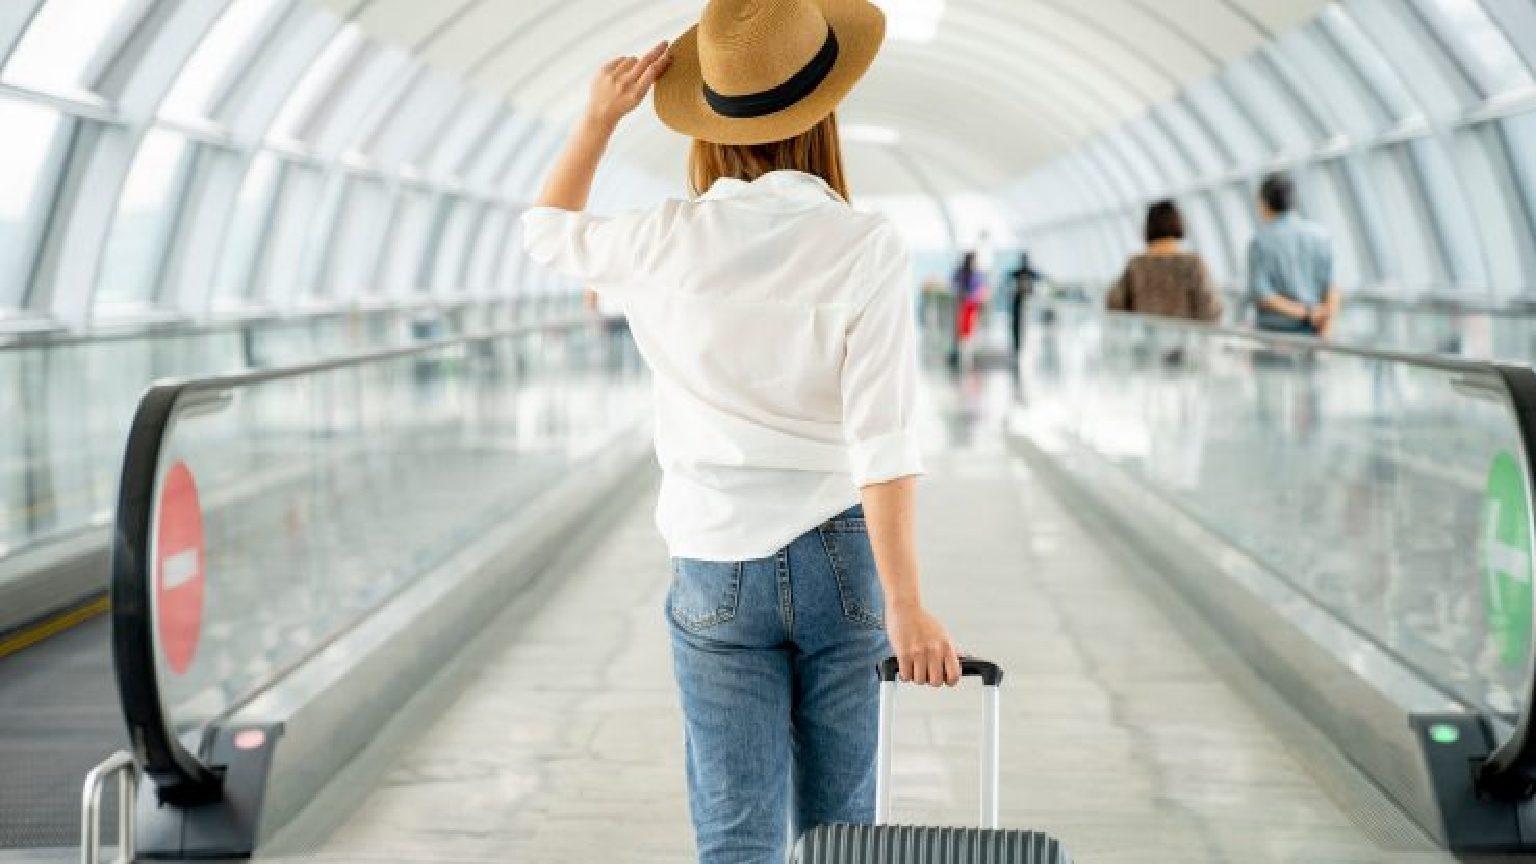 Traveler walking through airport with suitcase